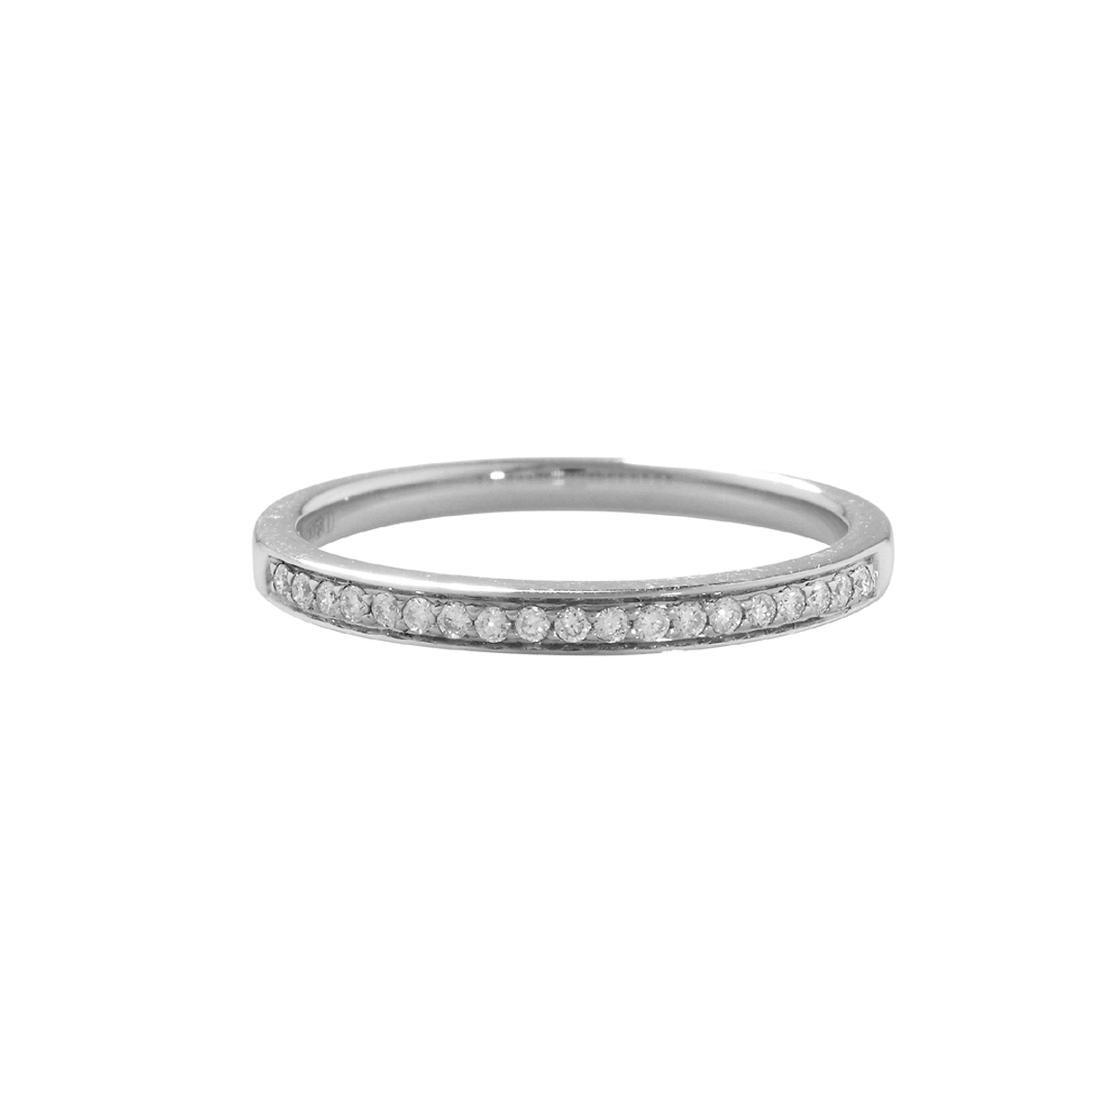 London Road Jewellery Luxury White Diamond Grain Set Stack Ring - UK L - US 5 1/2 - EU 51 3/4 7Q83Vakd